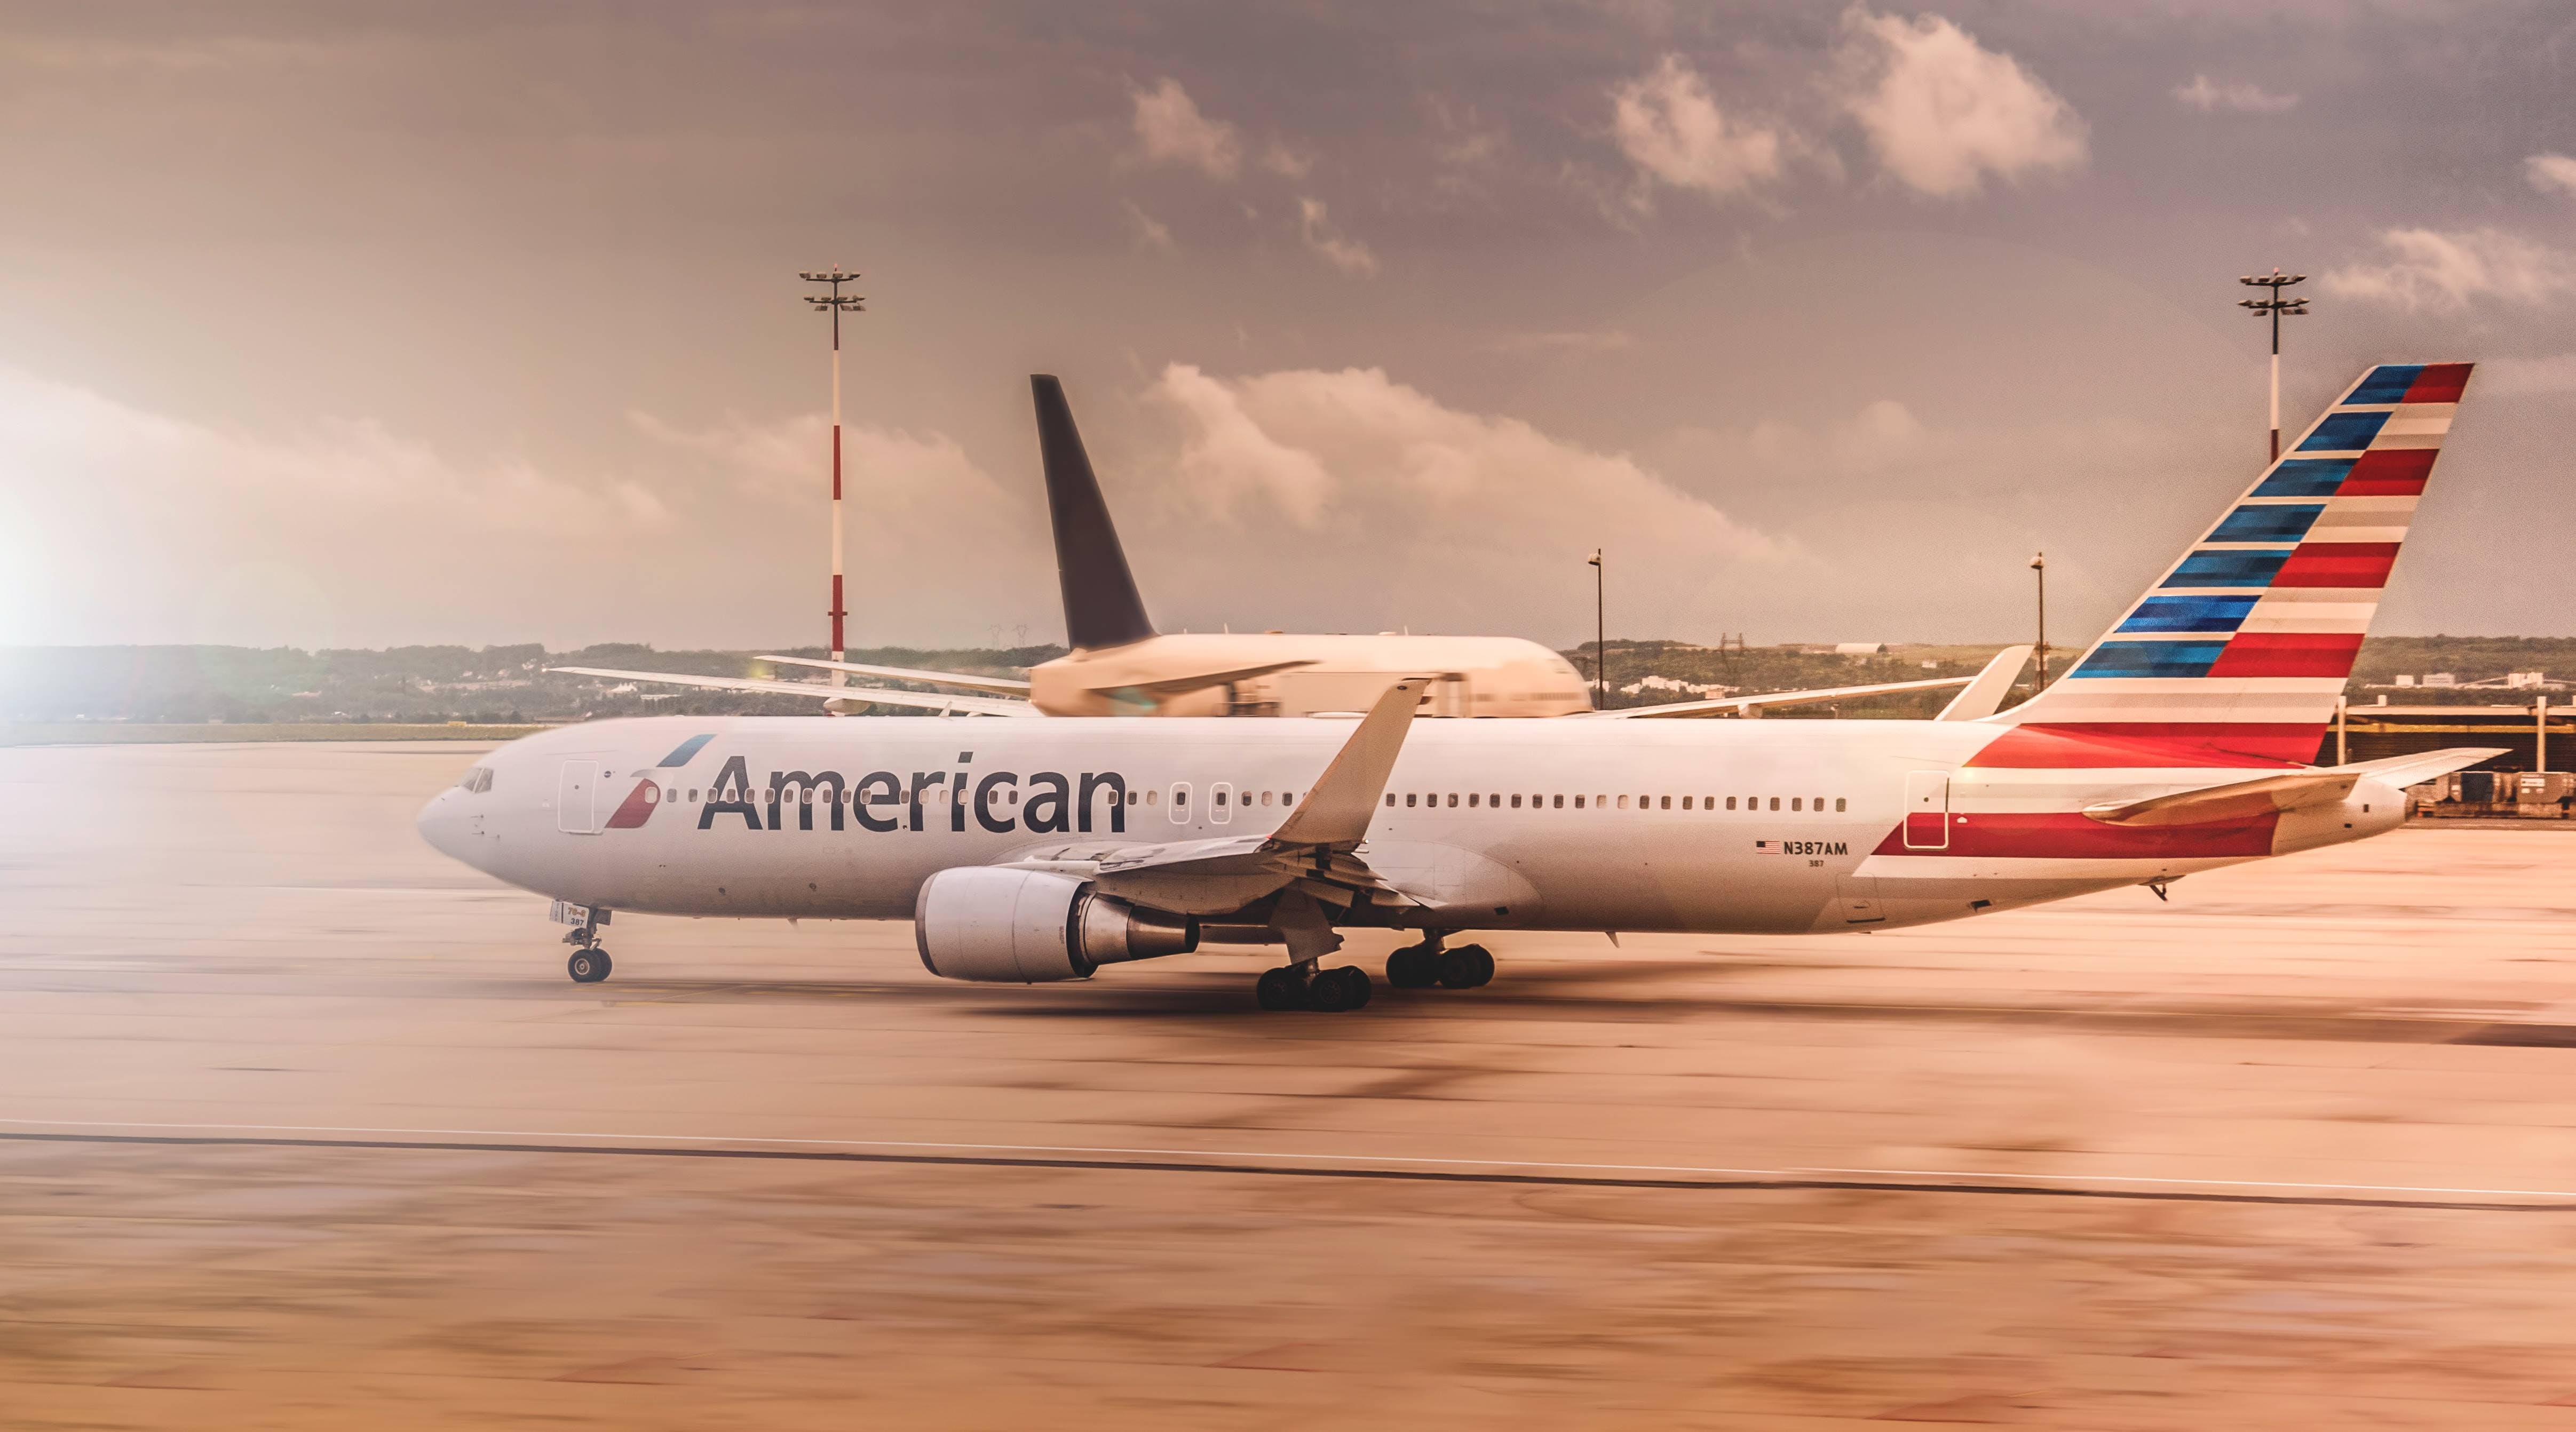 aeroplane, air travel, airbus